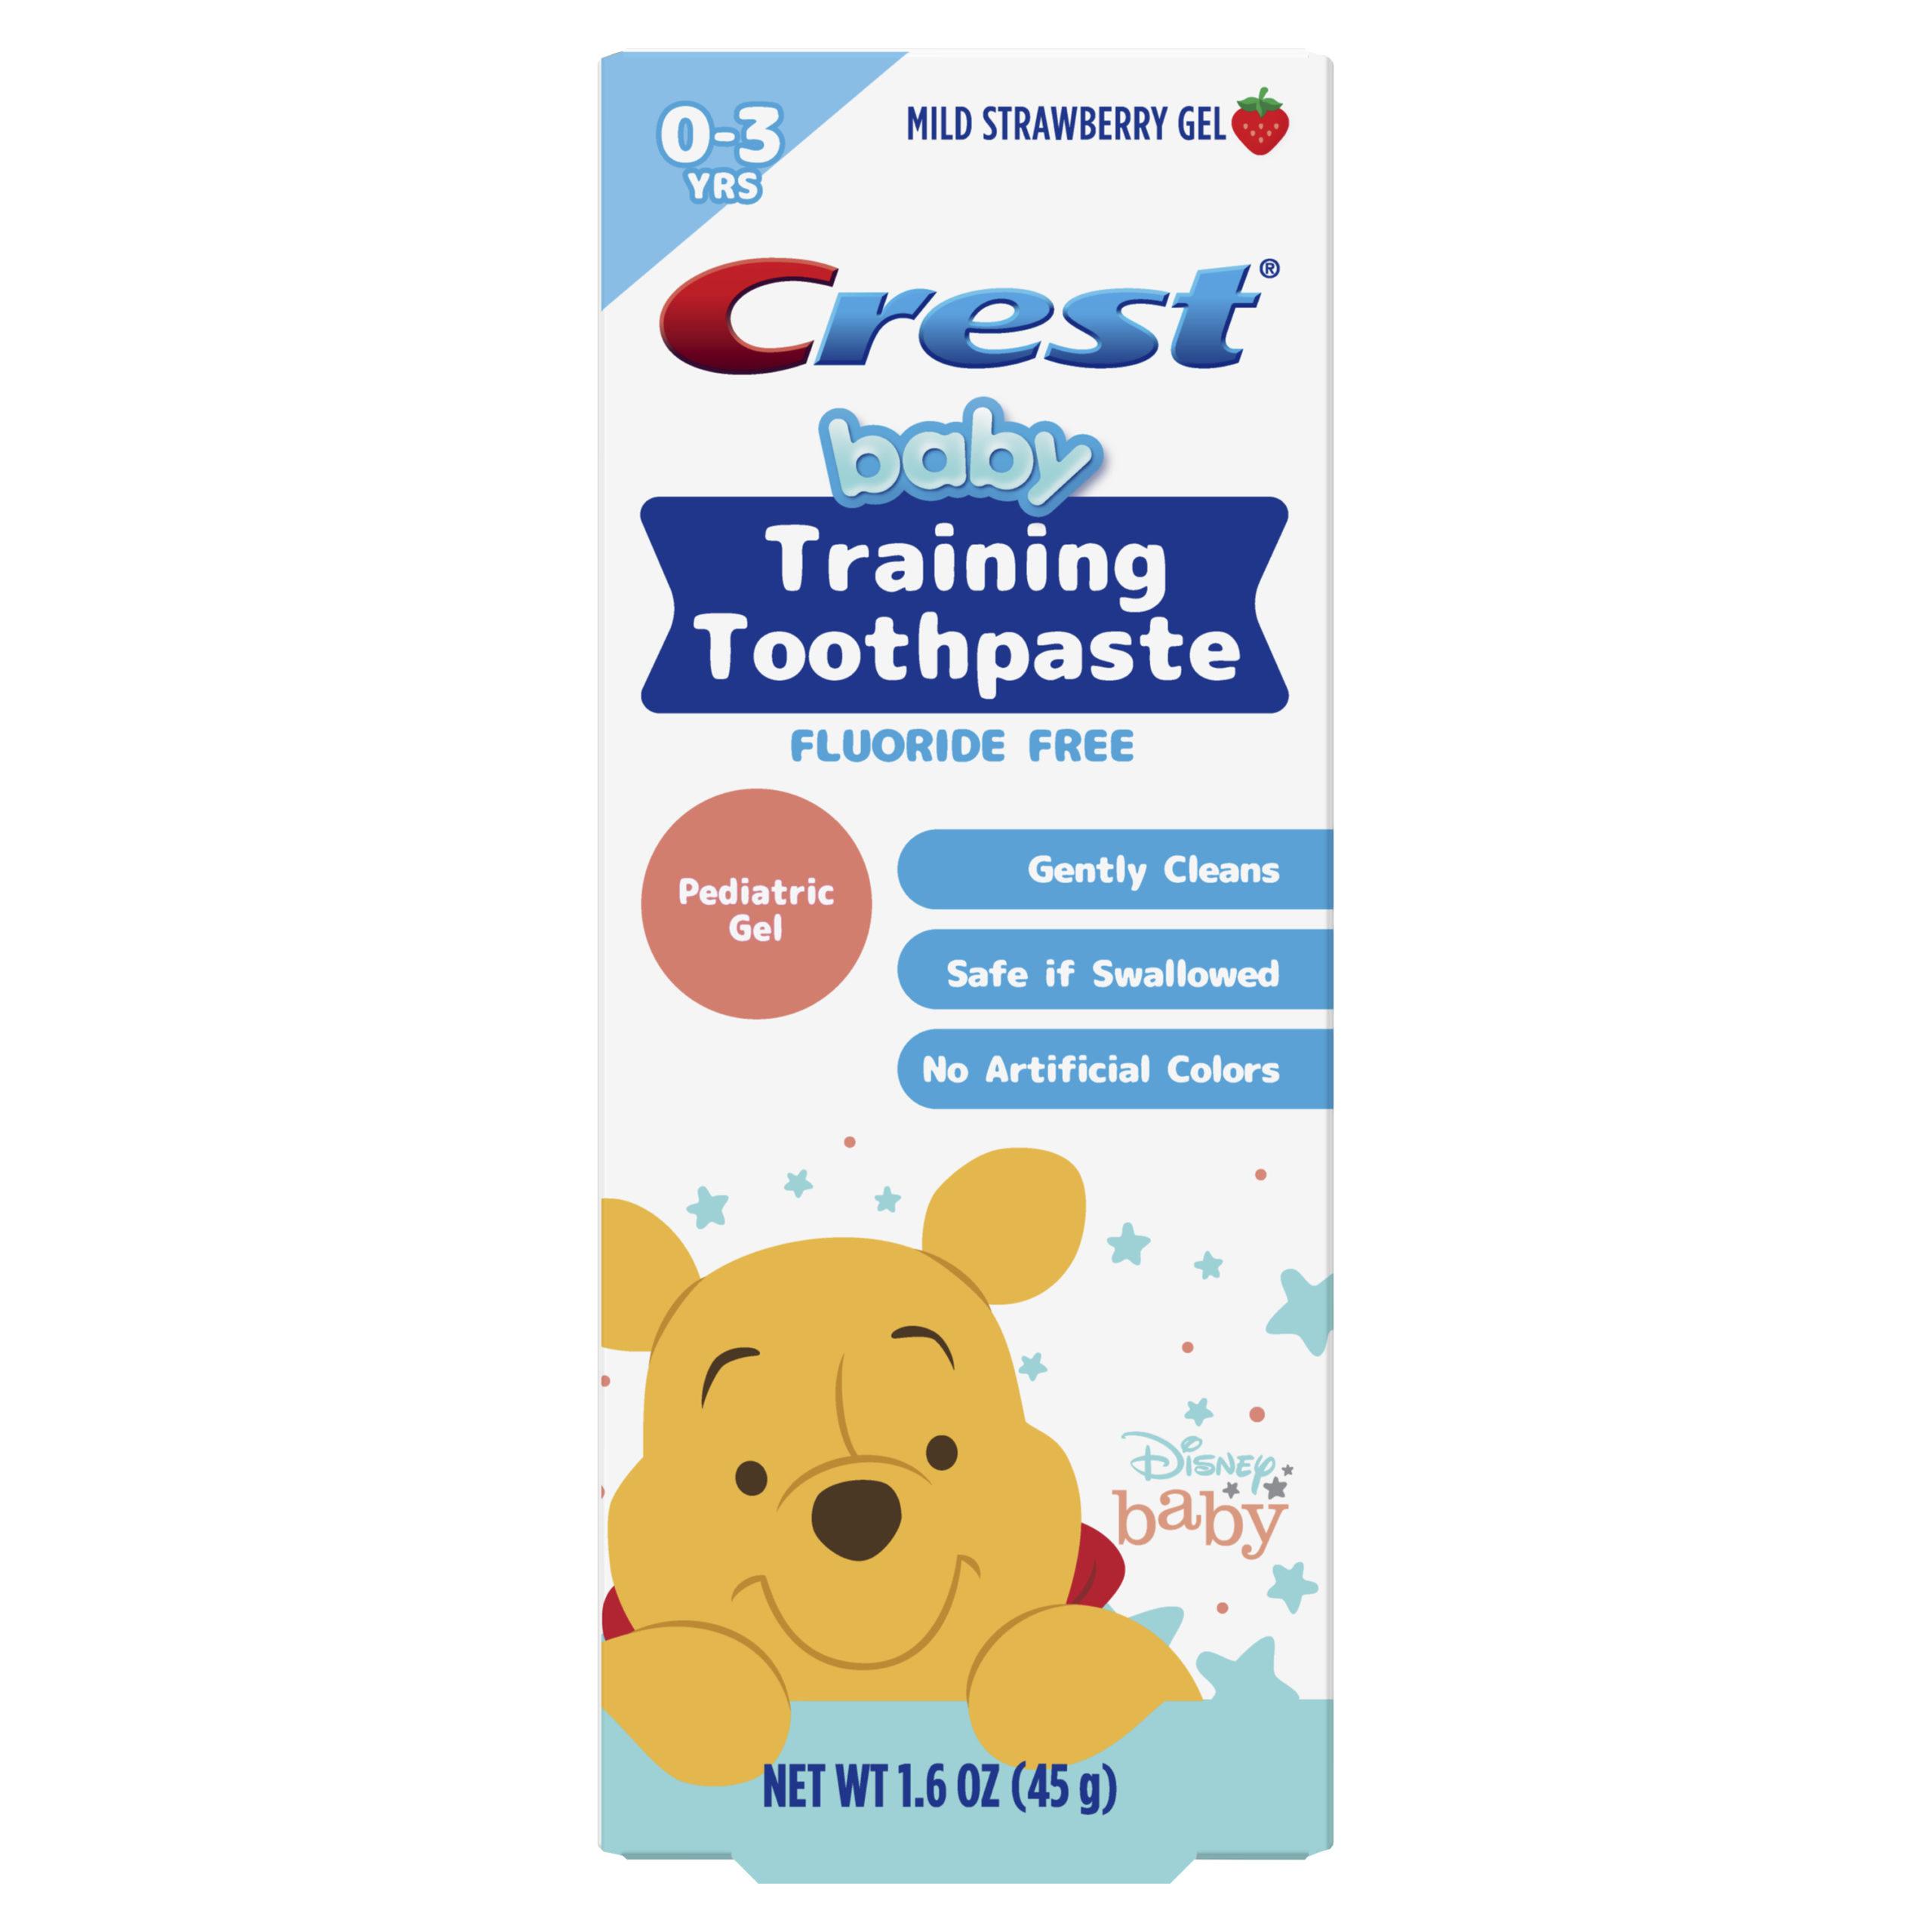 Crest Training Toothpaste, featuring Disney's Winnie the Pooh, Mild Strawberry Gel